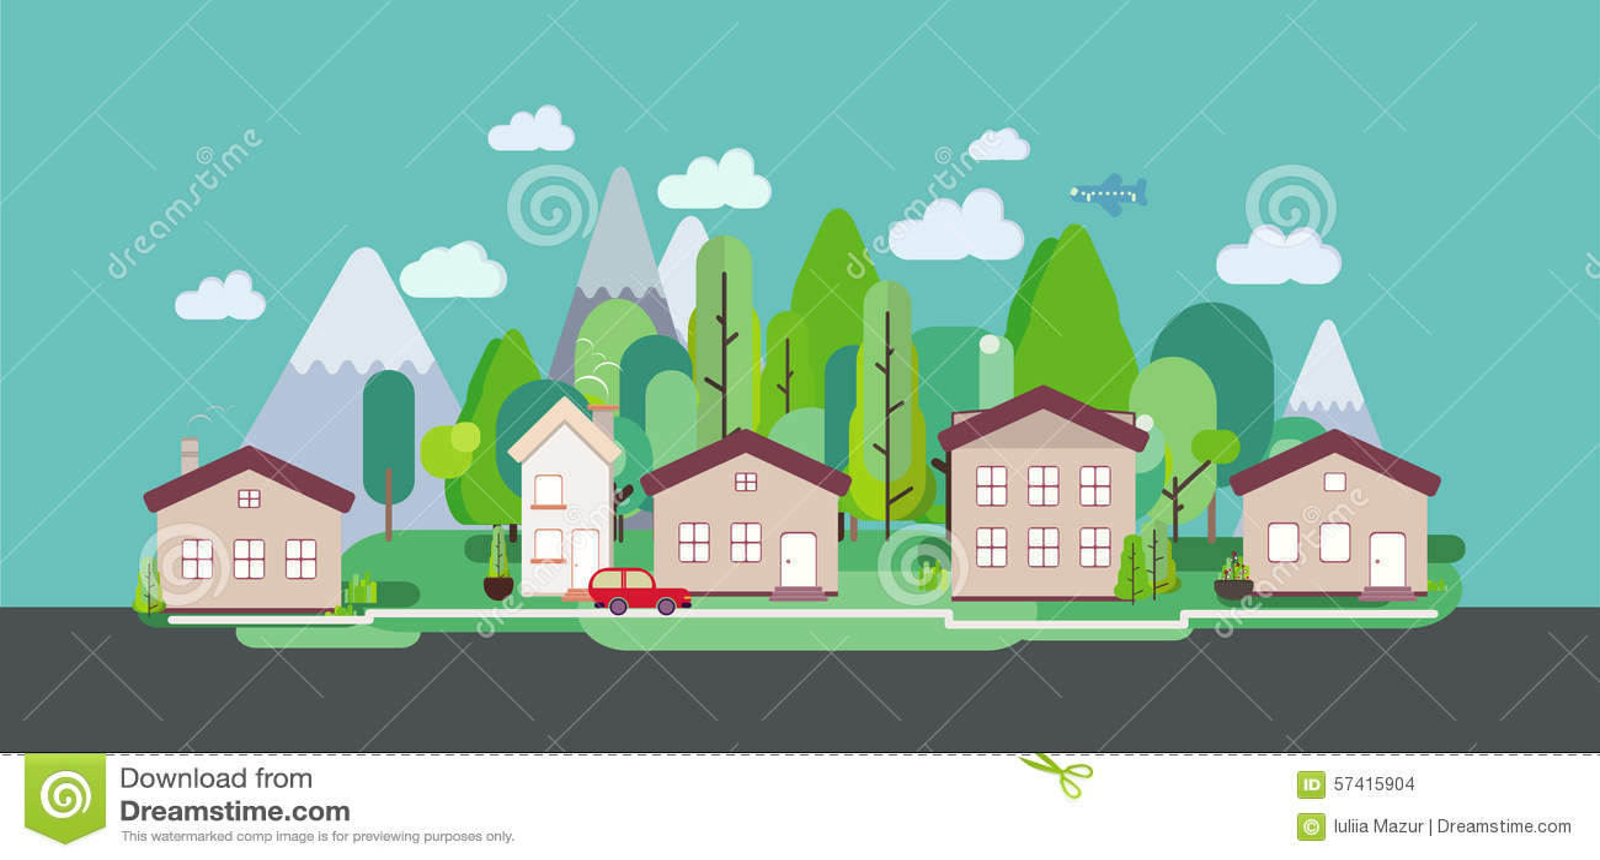 Poster design nature -  Design Nature Landscape Tourism Web Poster Stock Vector Download